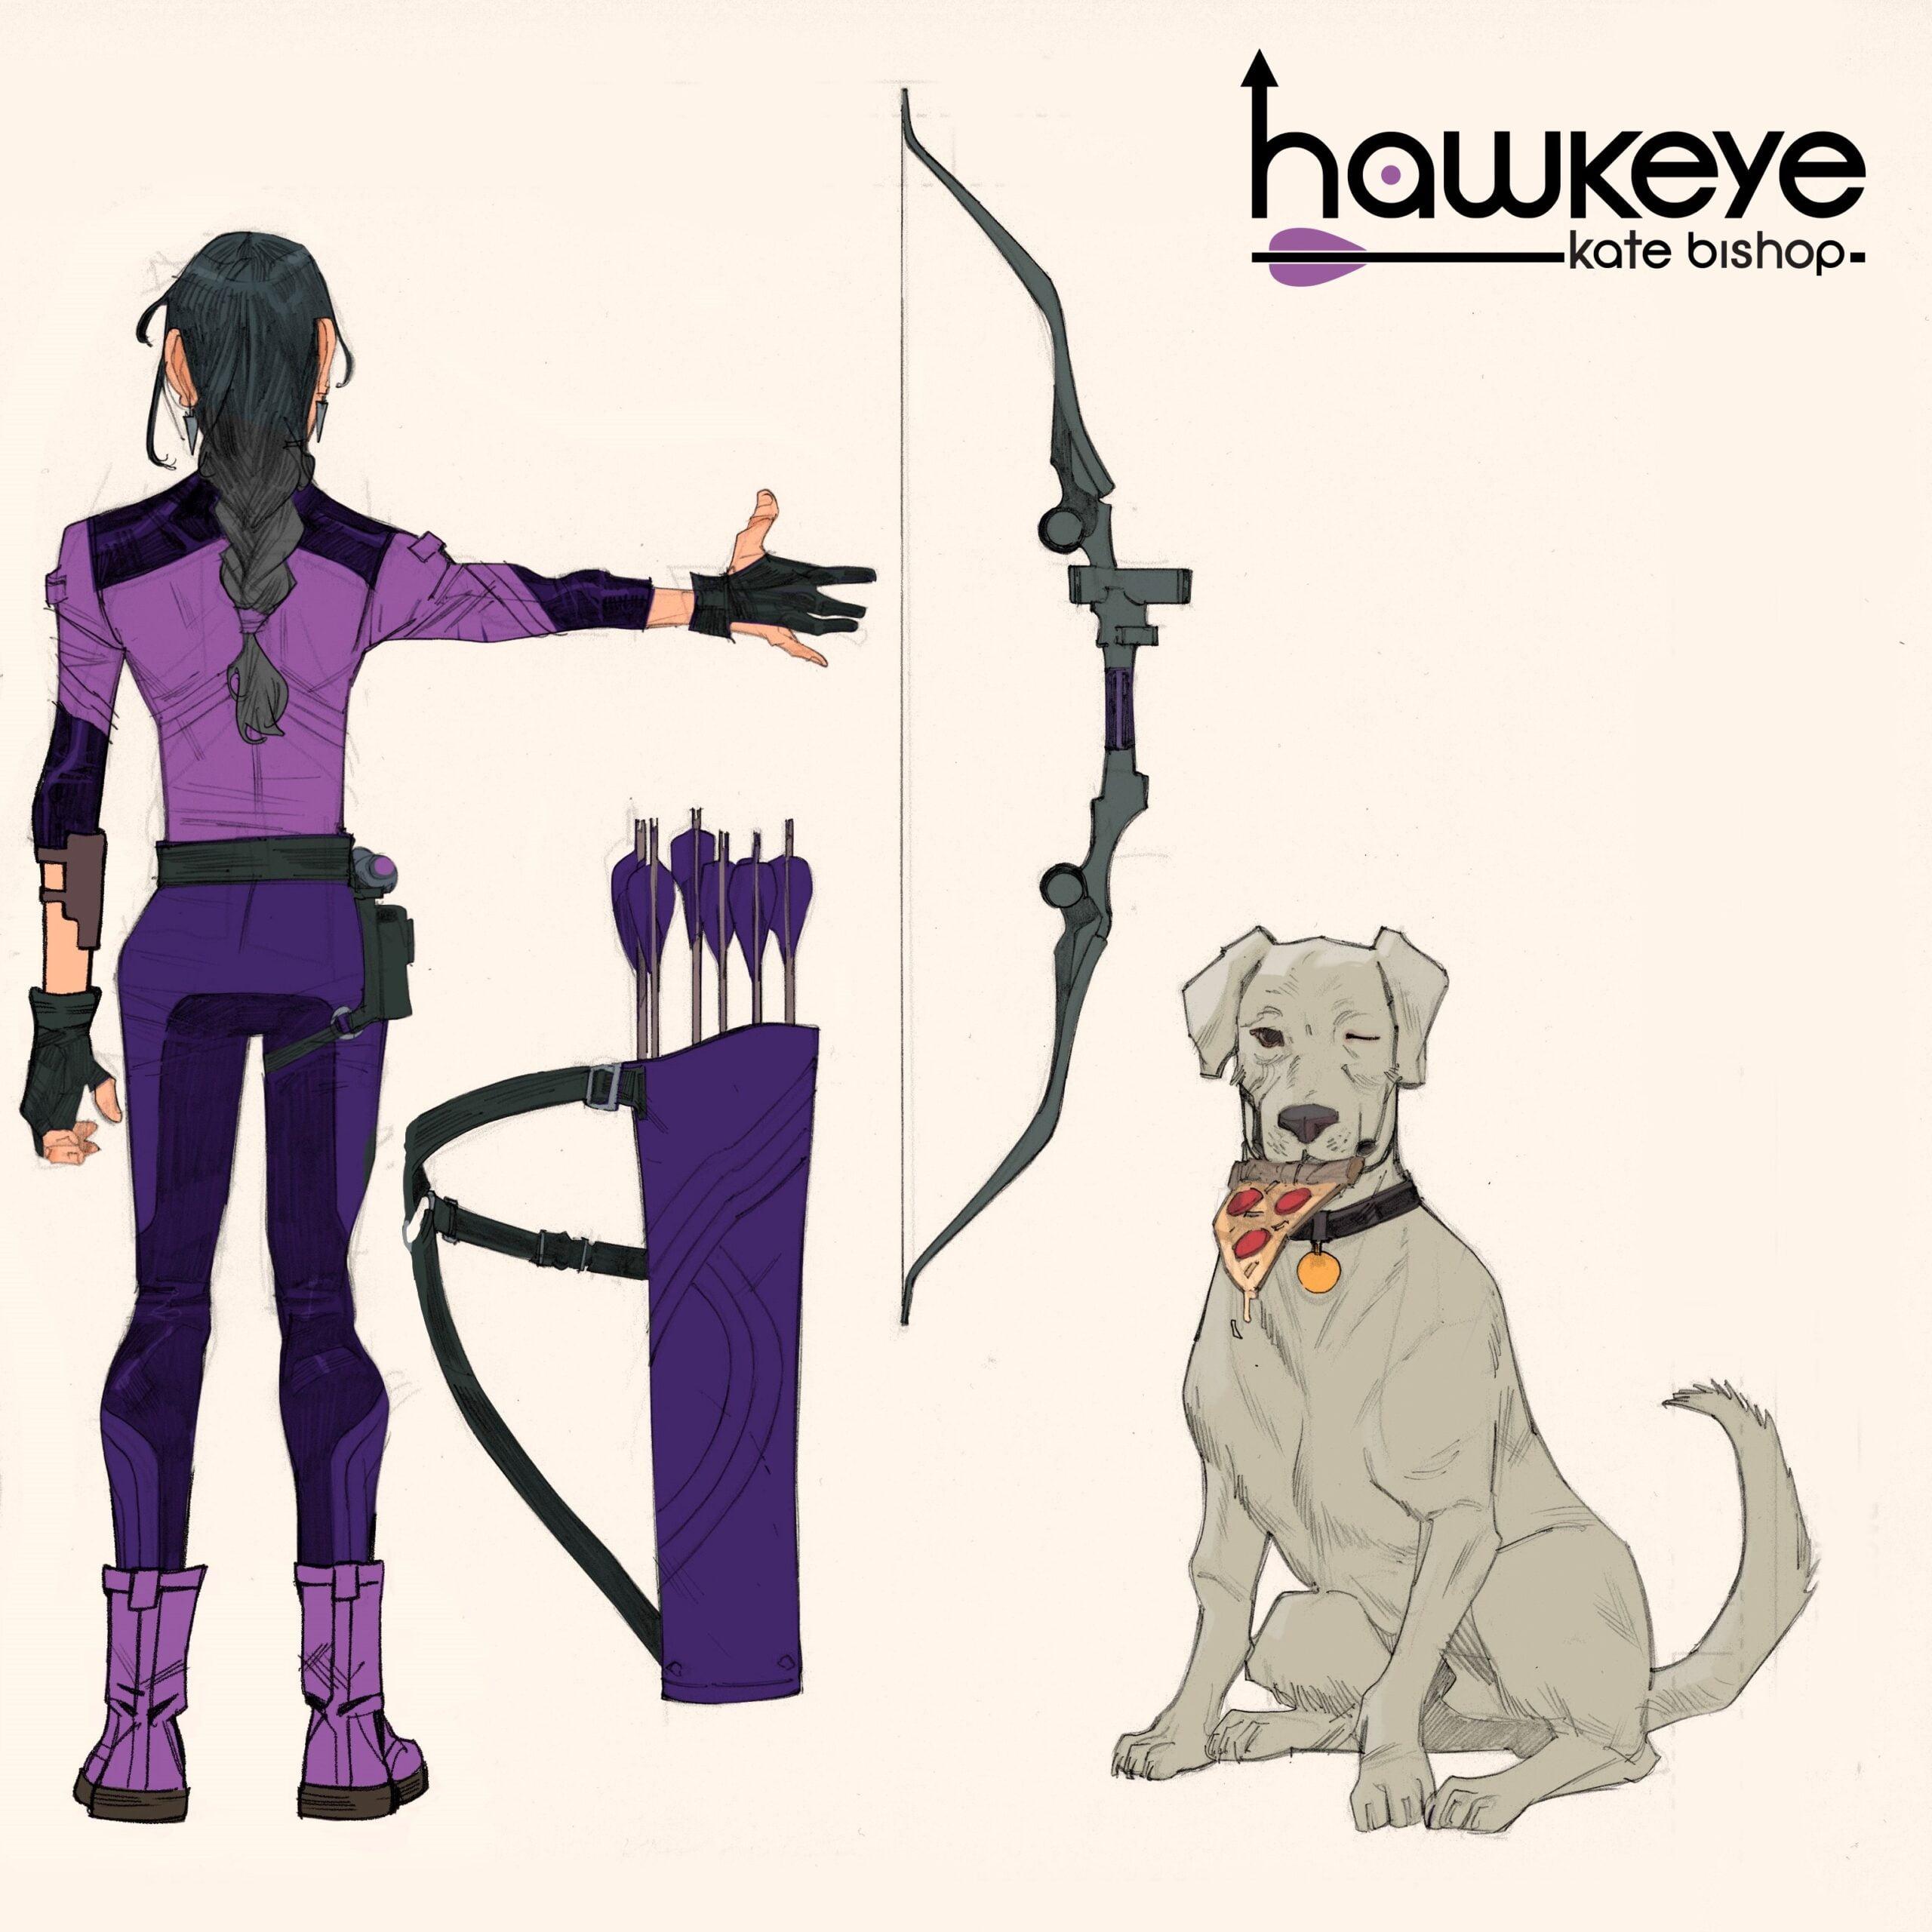 Hawkeye via Enid Balam for Marvel Comics for use by 360 Magazine